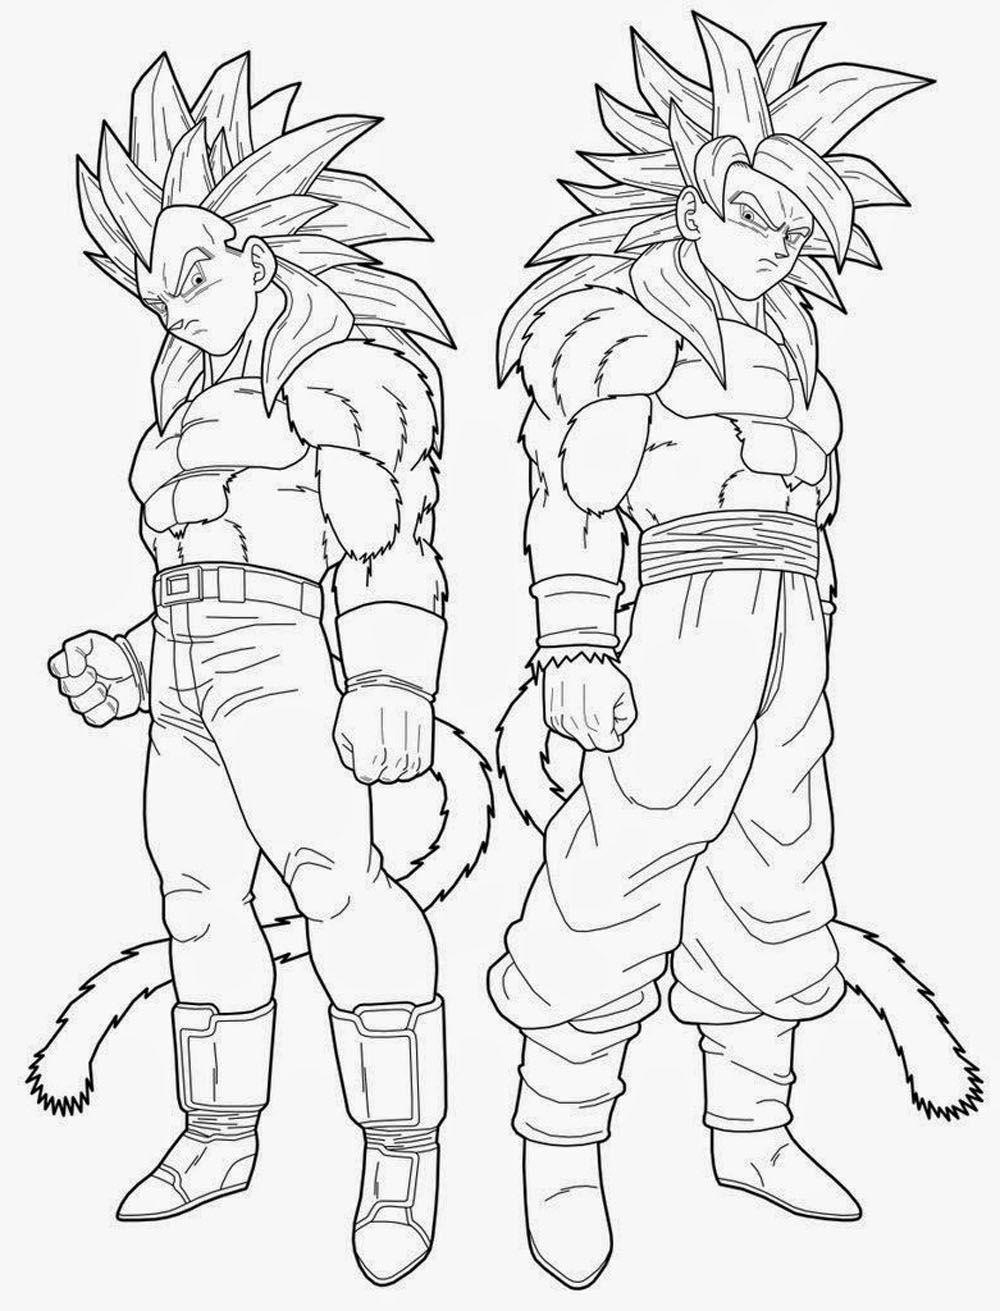 Dibujo De Goku Y Vegeta Fase 4 De Drago H Dragon Ball